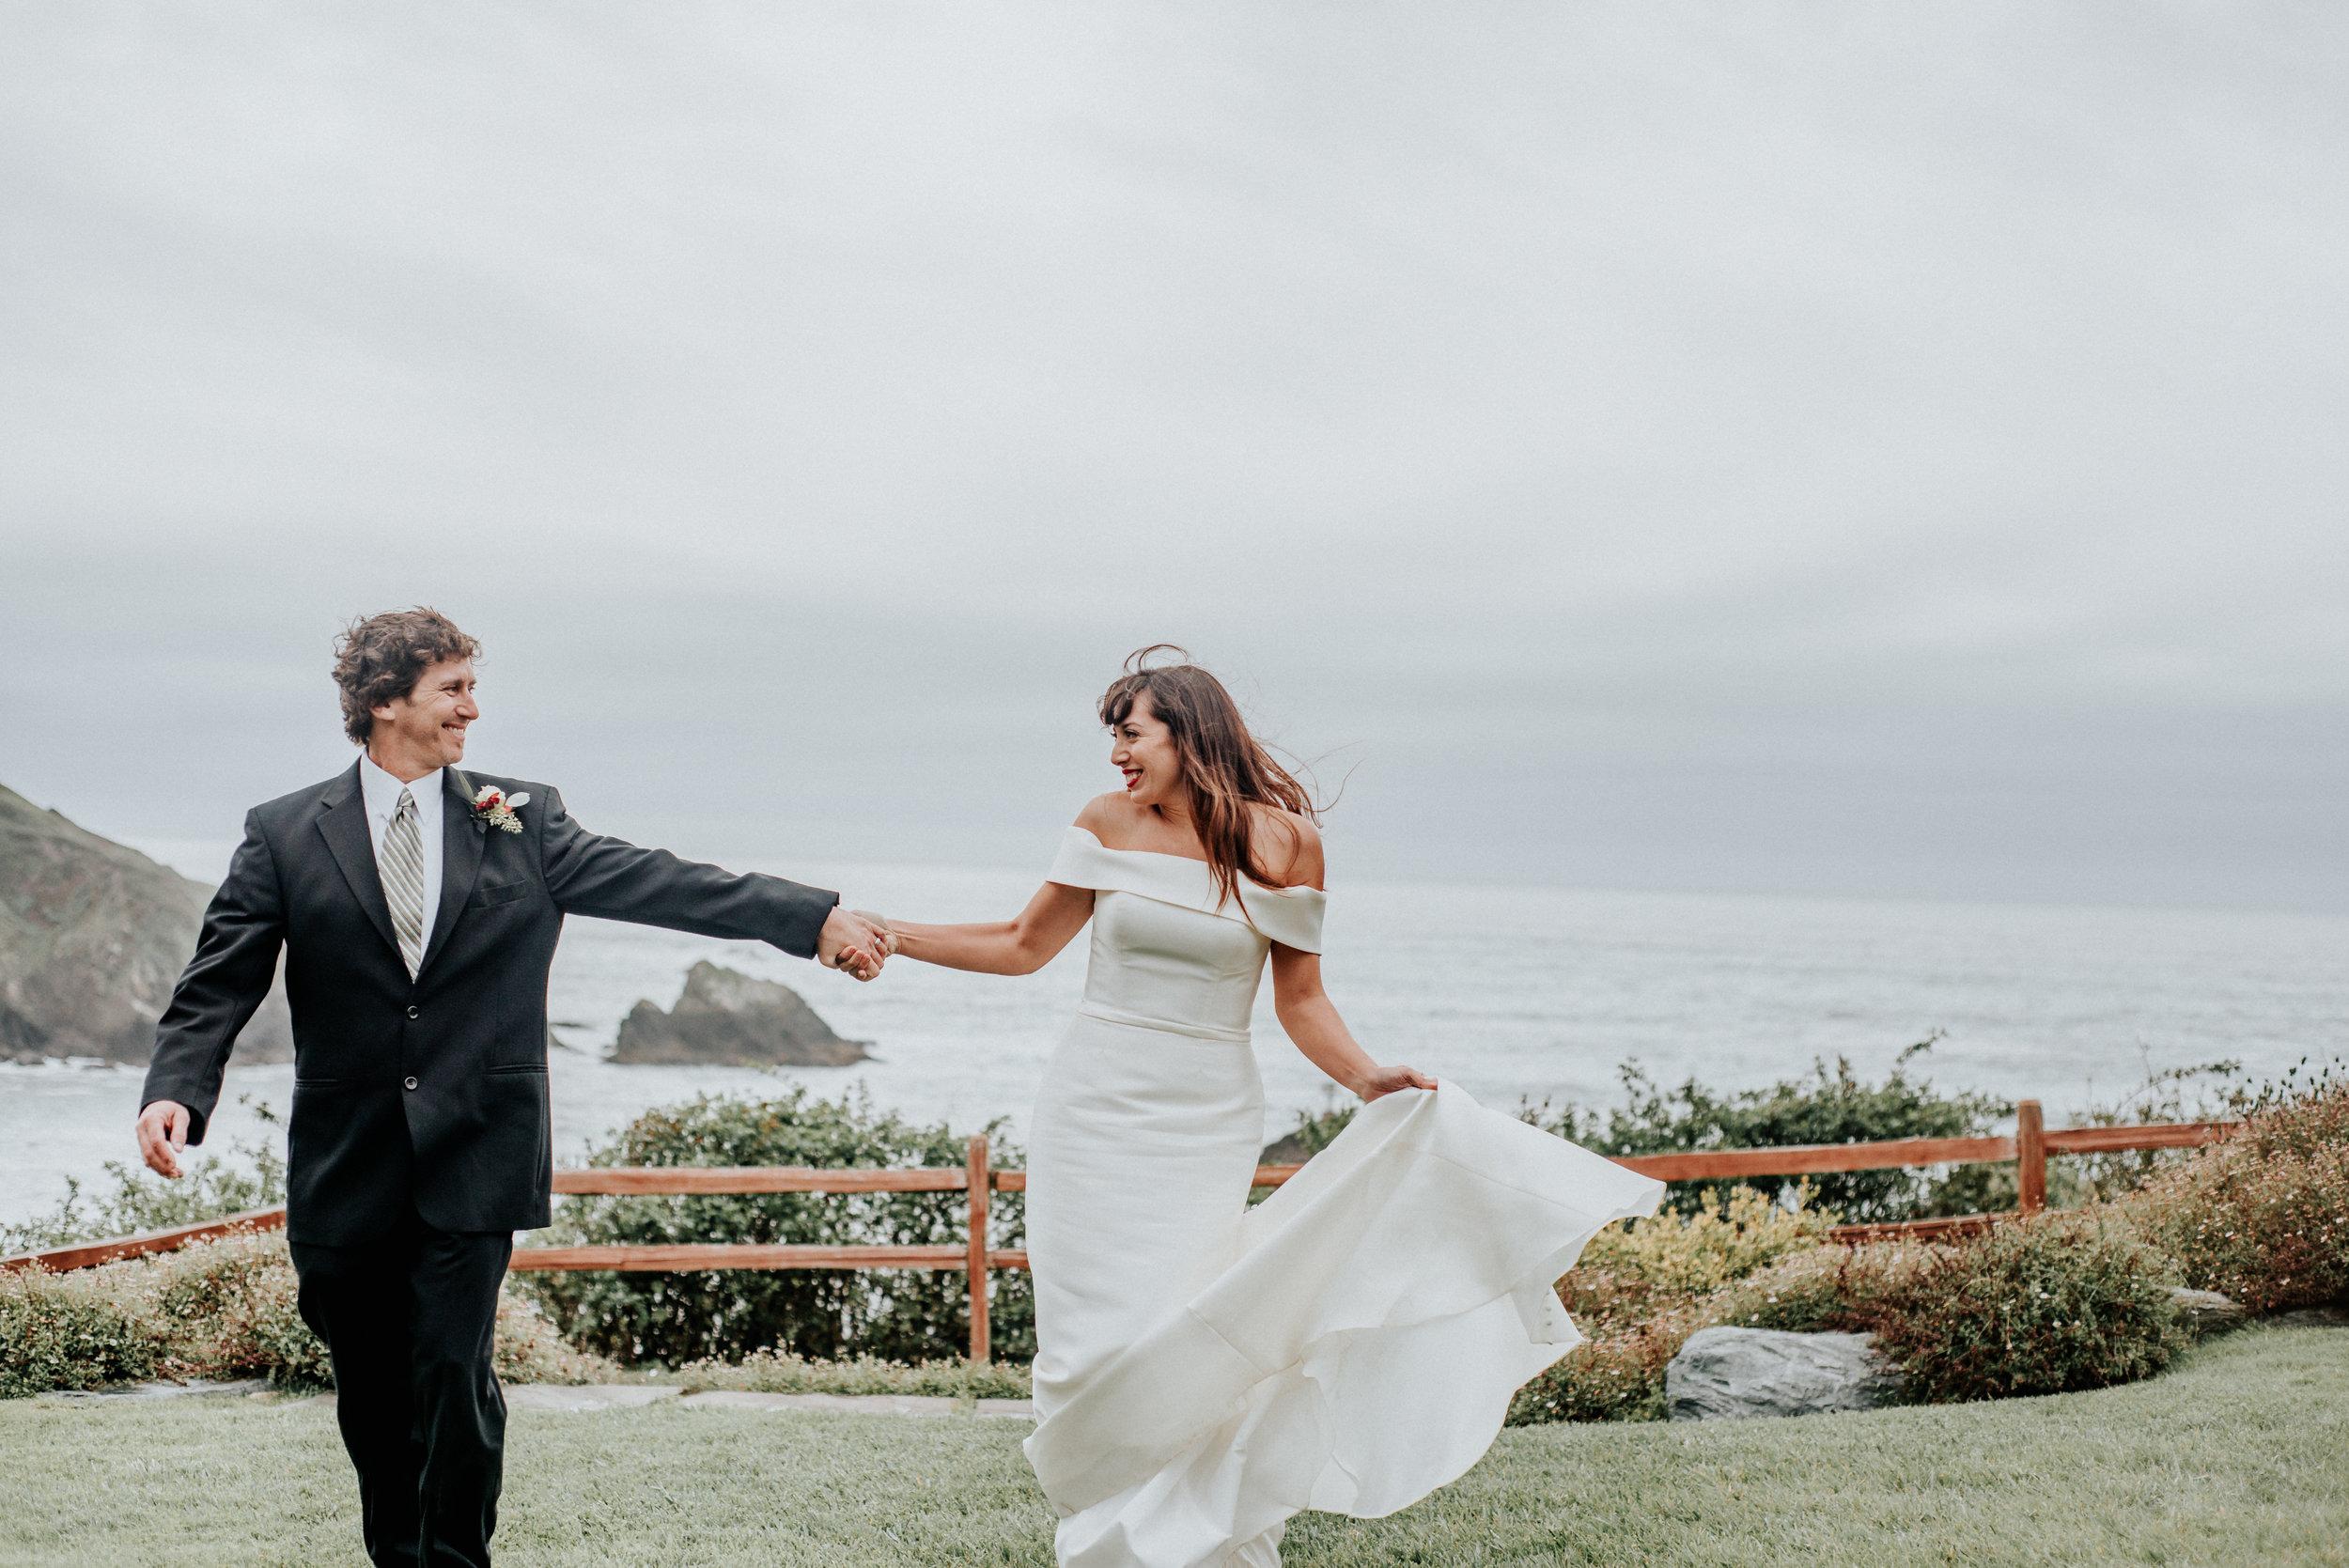 Albion River Inn Wedding in Albion Caliornia-45.jpg